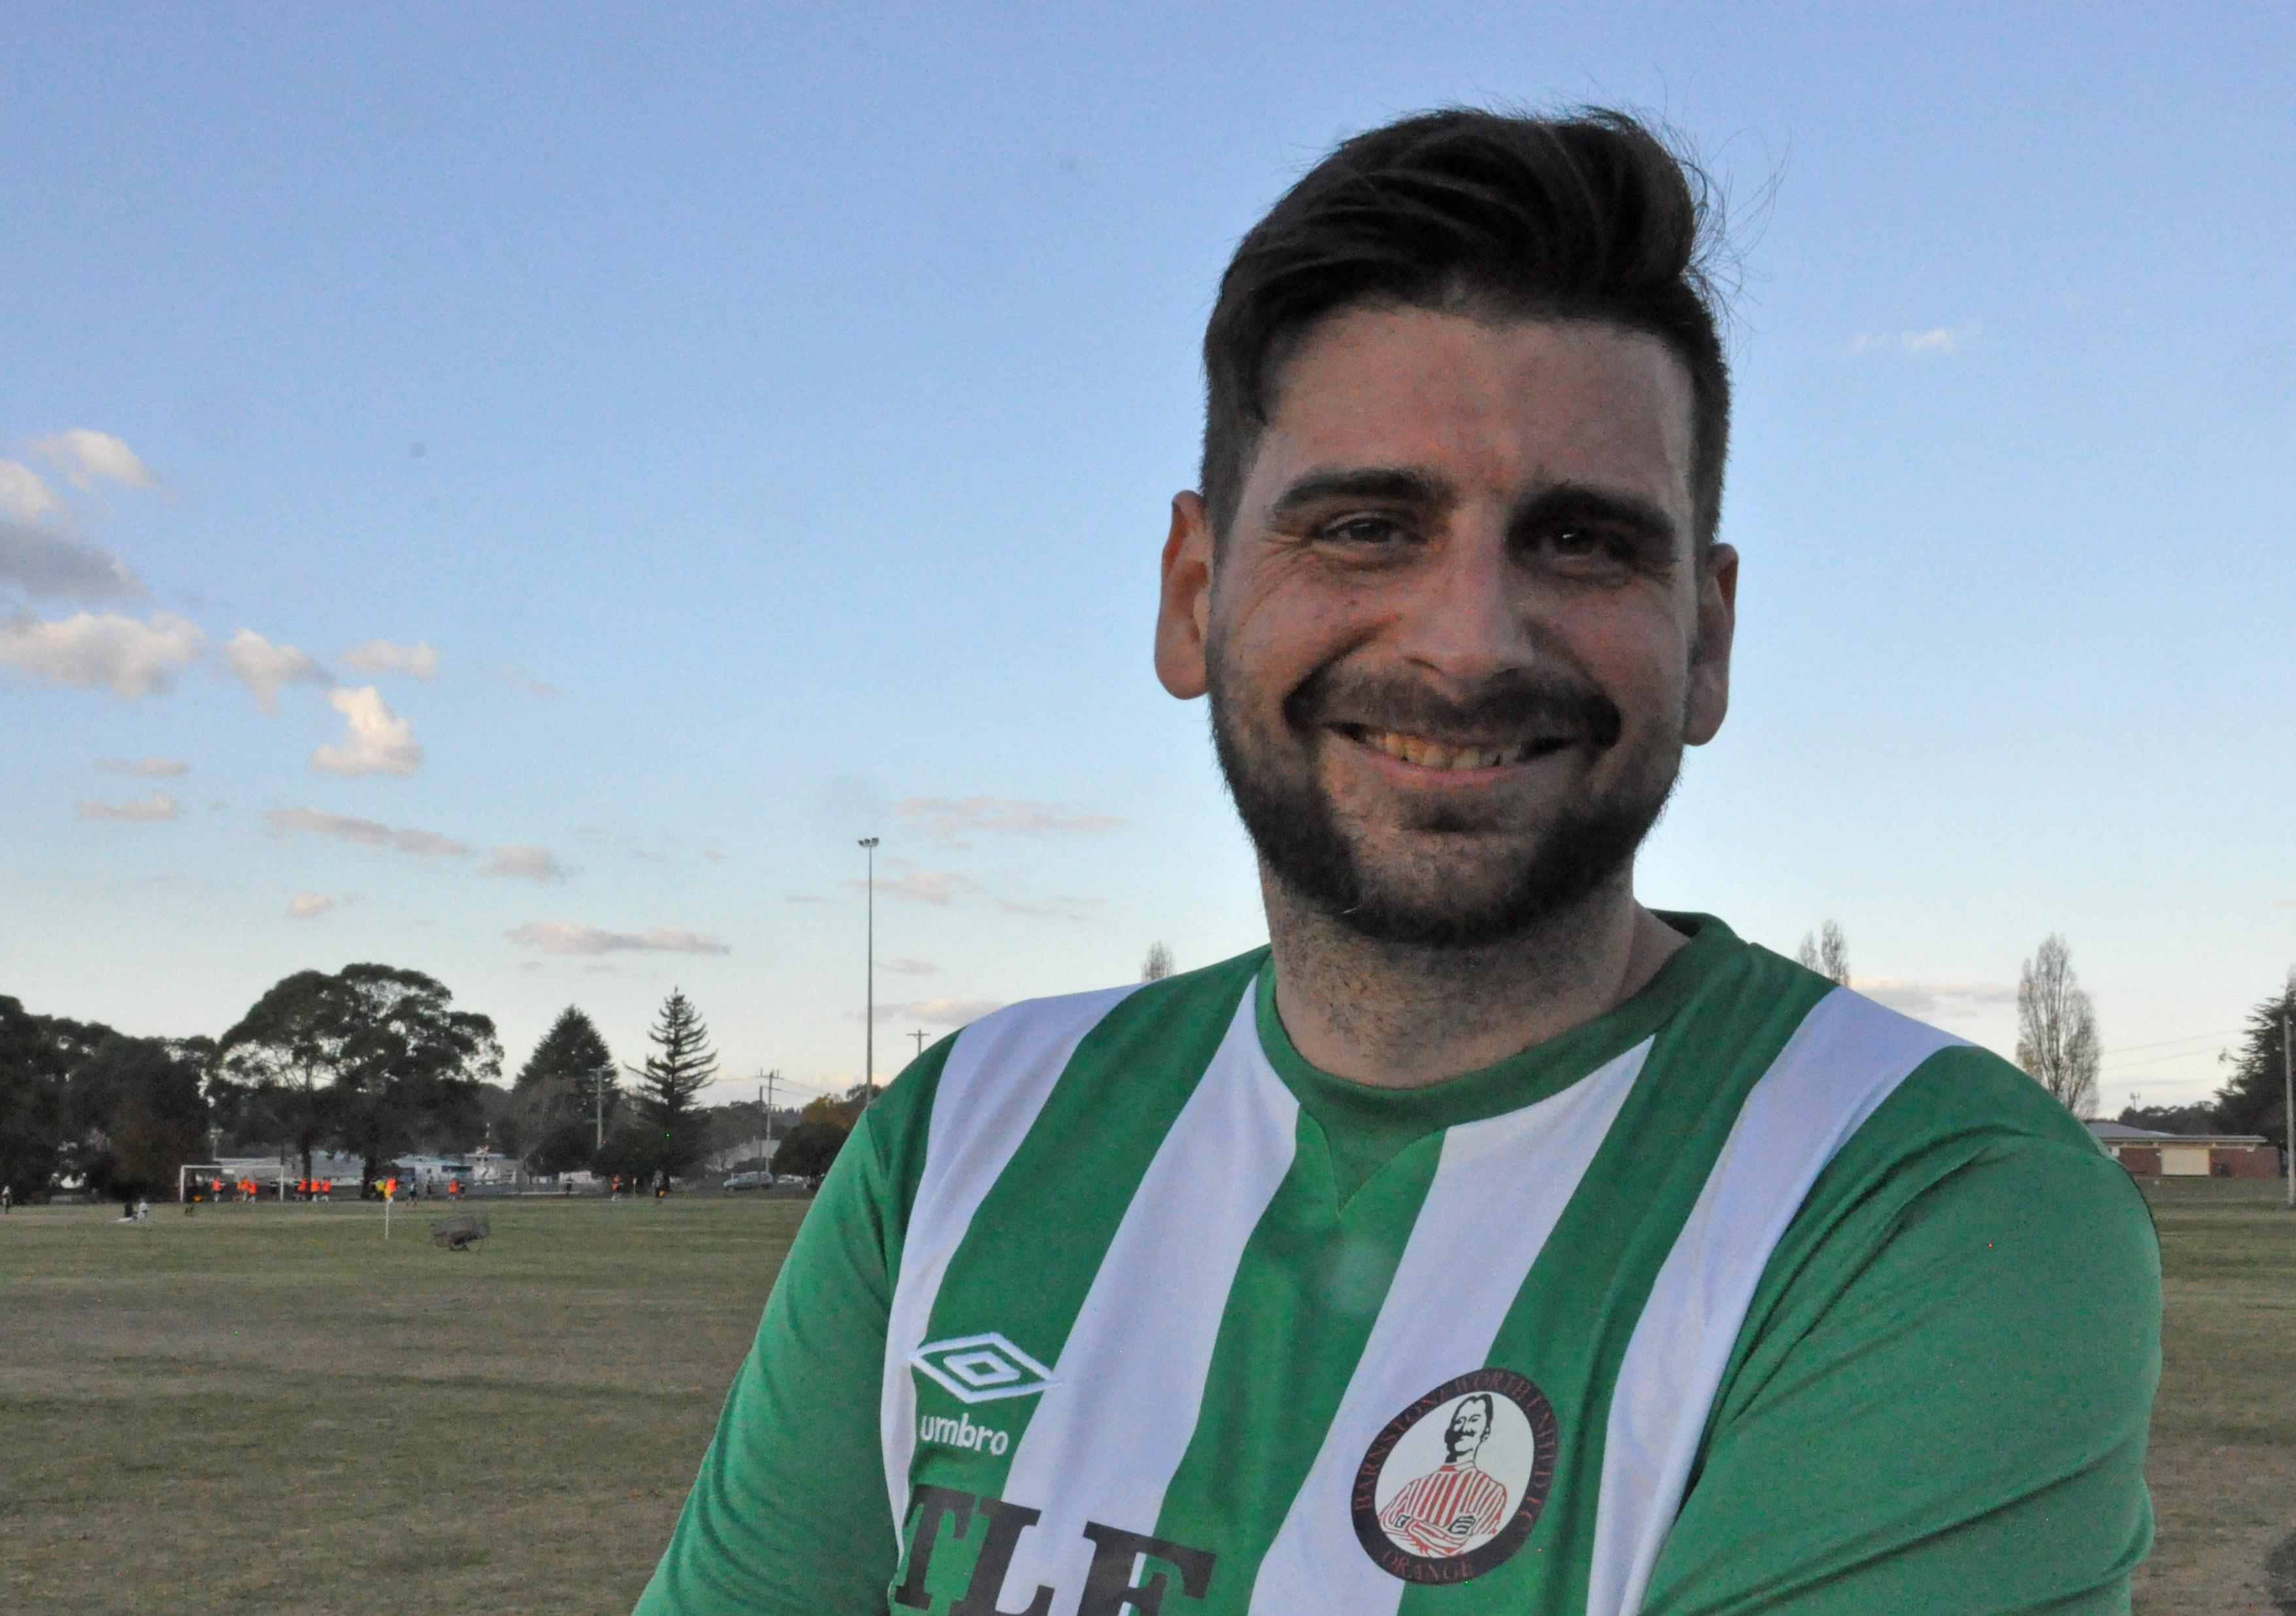 Andrew Pancini